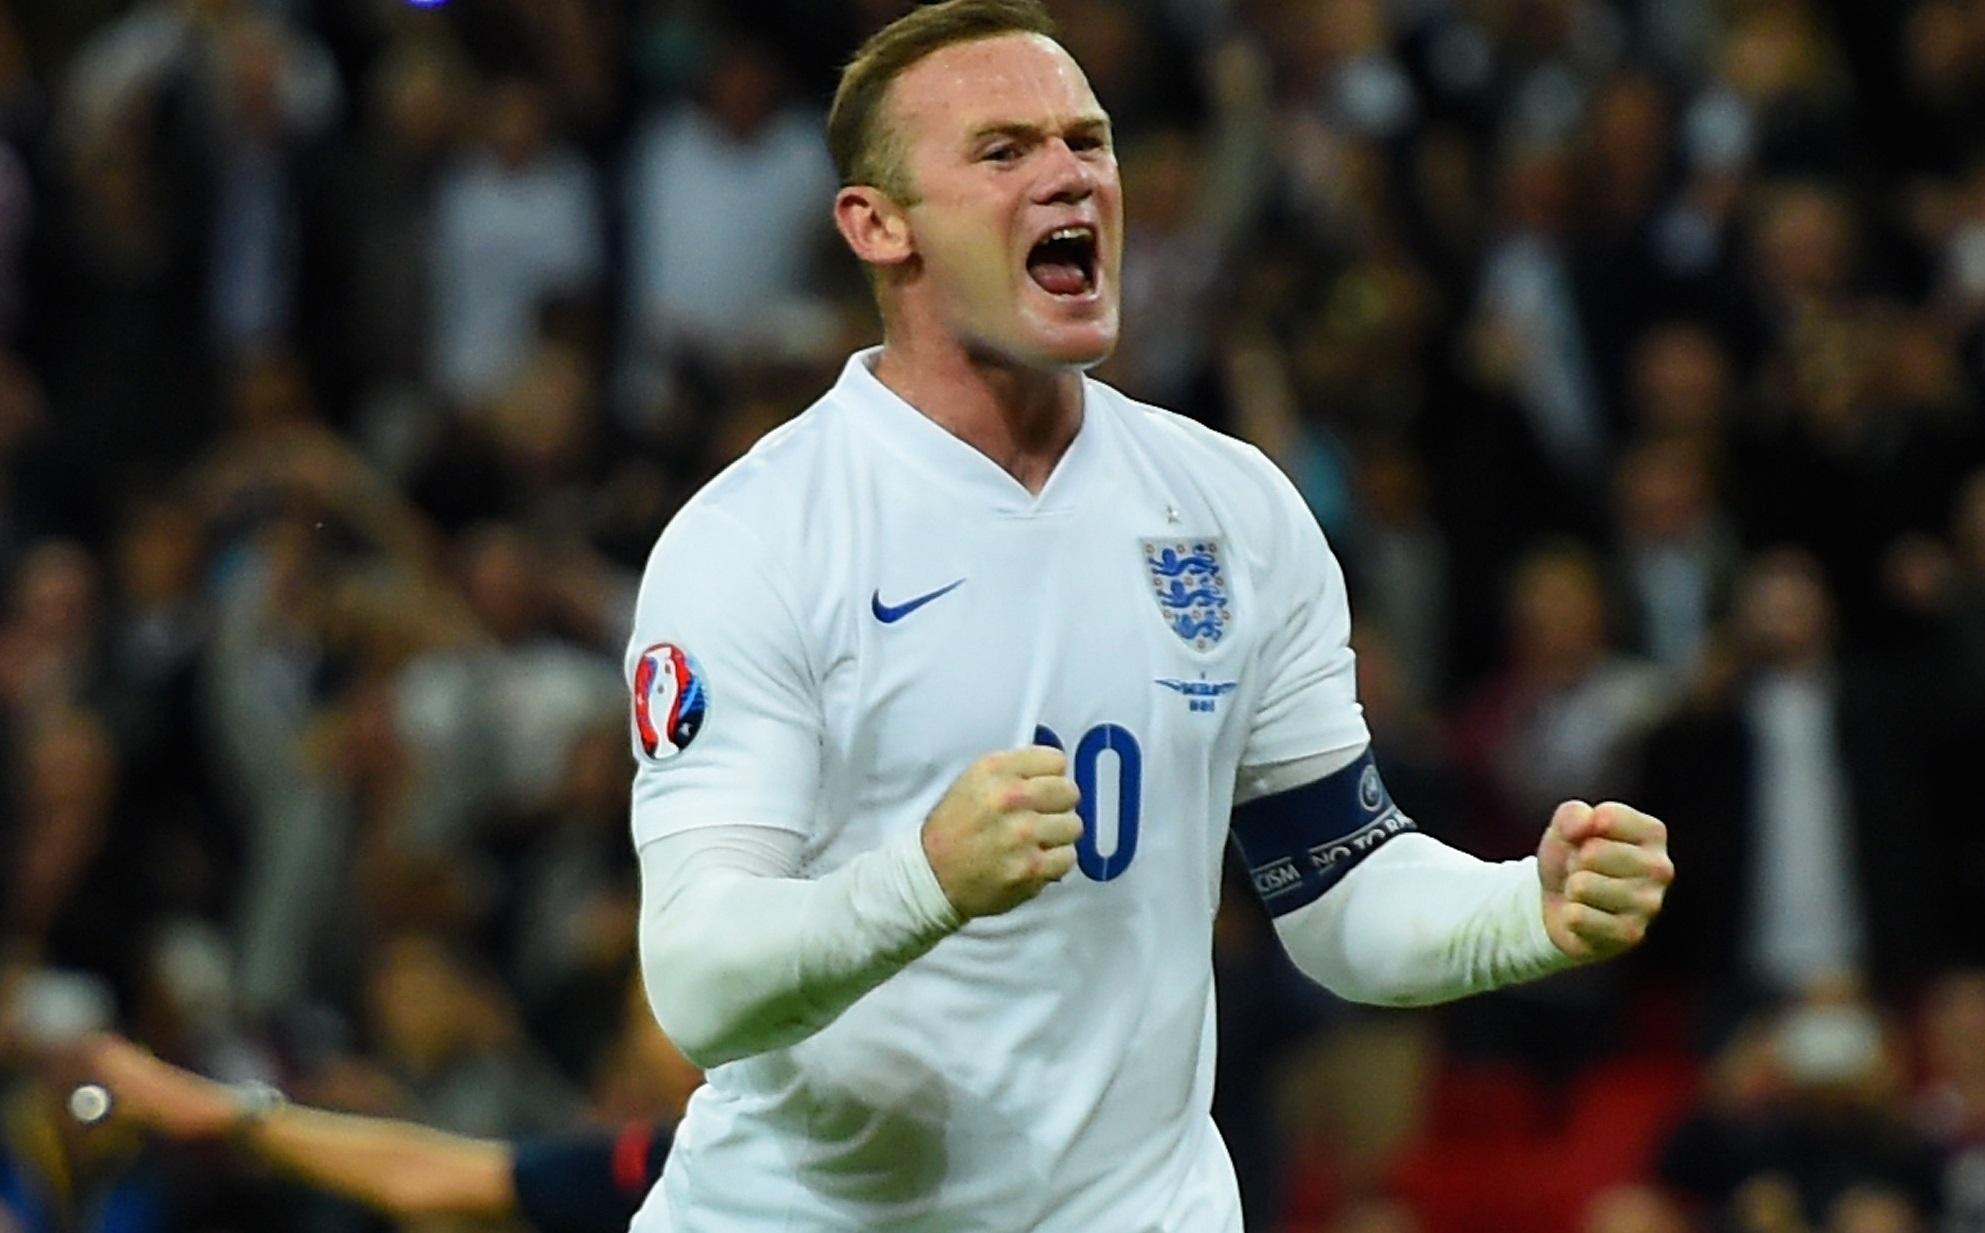 Wayne Rooney (Shaun Botterill/Getty Images)